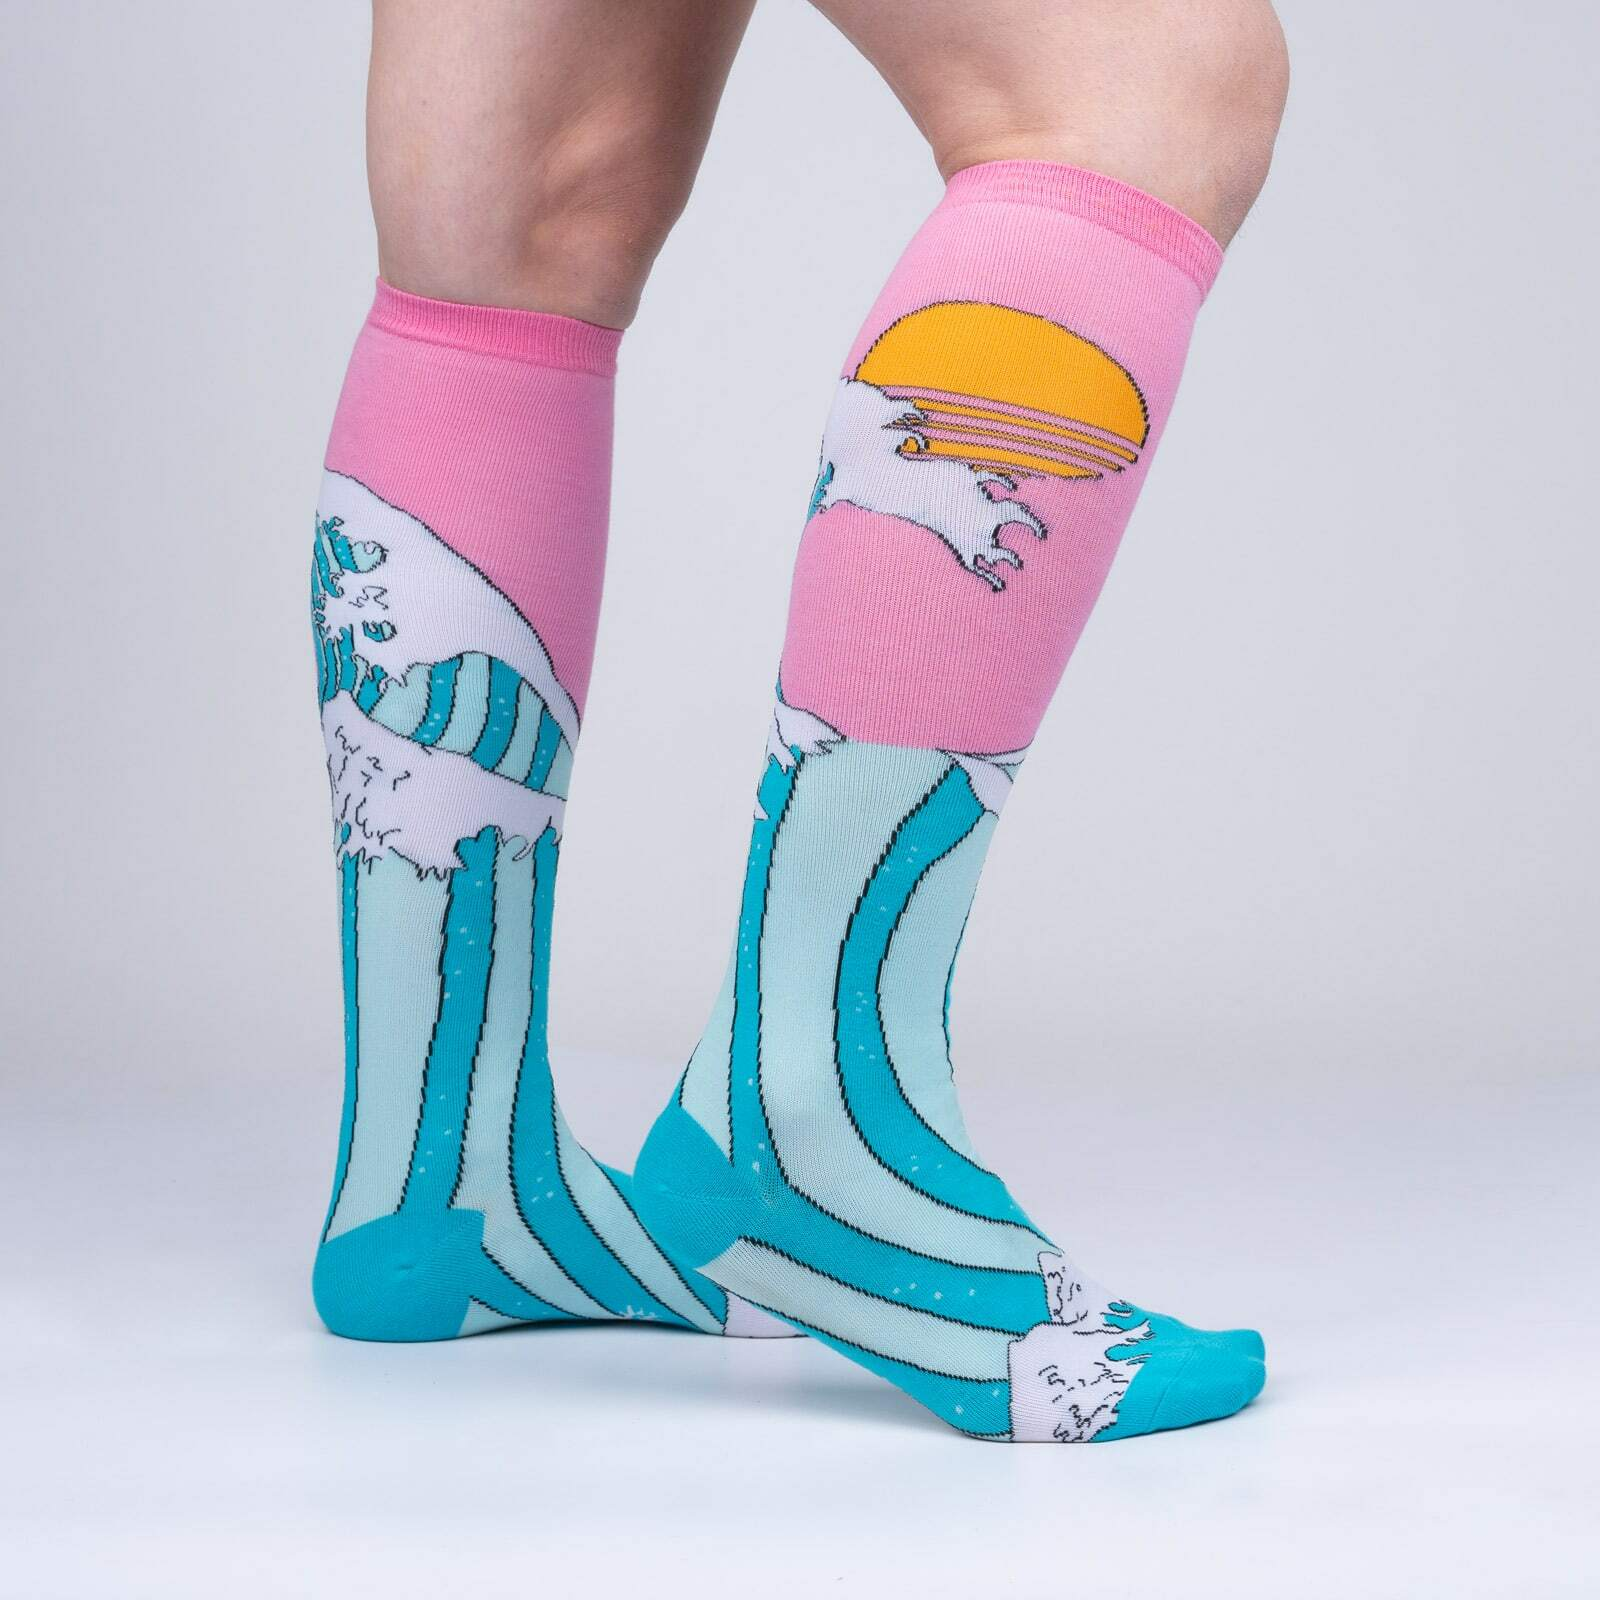 model side view of The Wave - Art History Vaporwave Knee High Socks - Women's